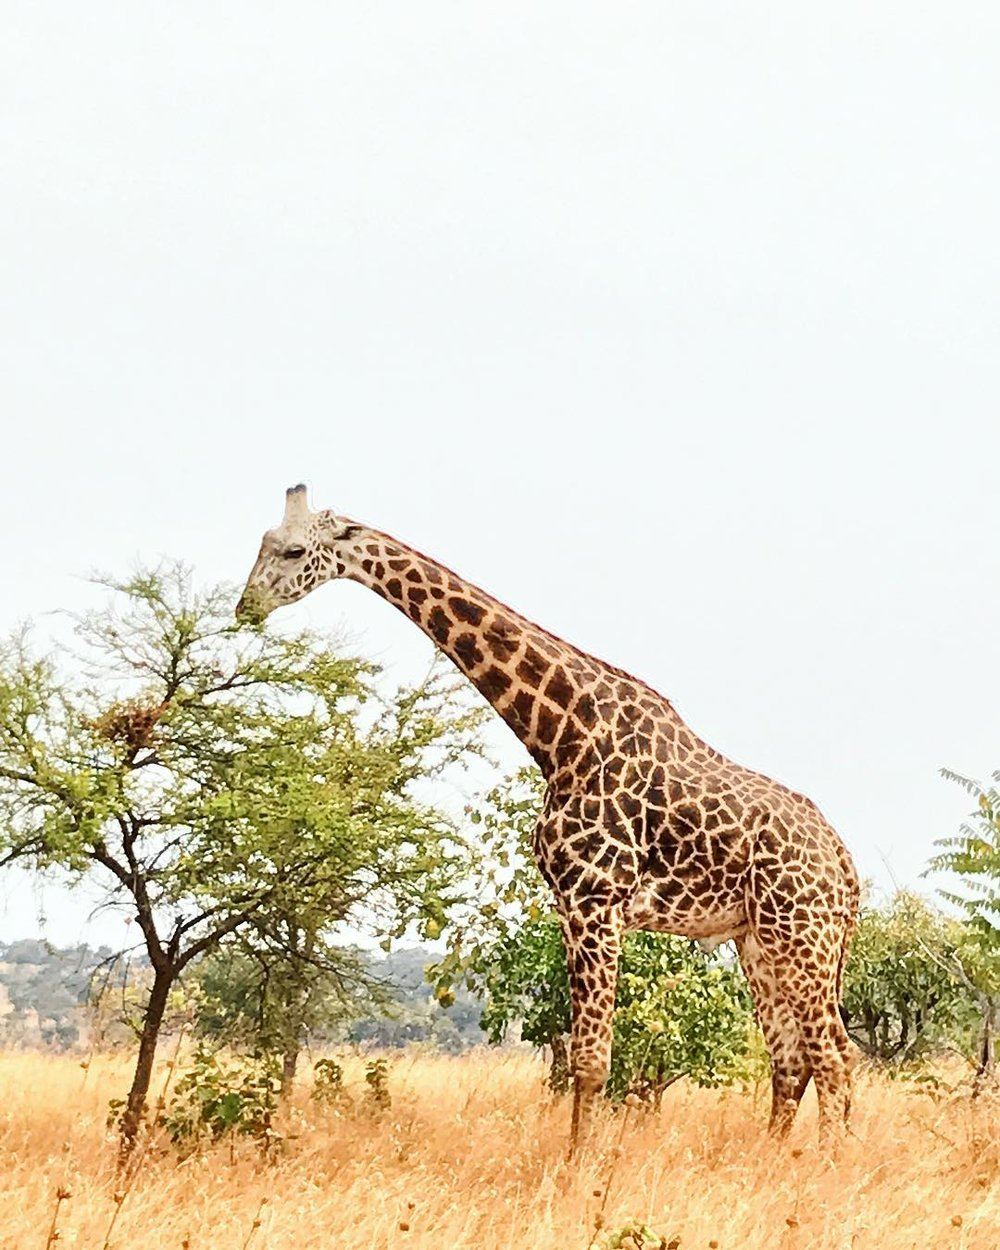 A closer snapshot of the giraffe at Akagera.